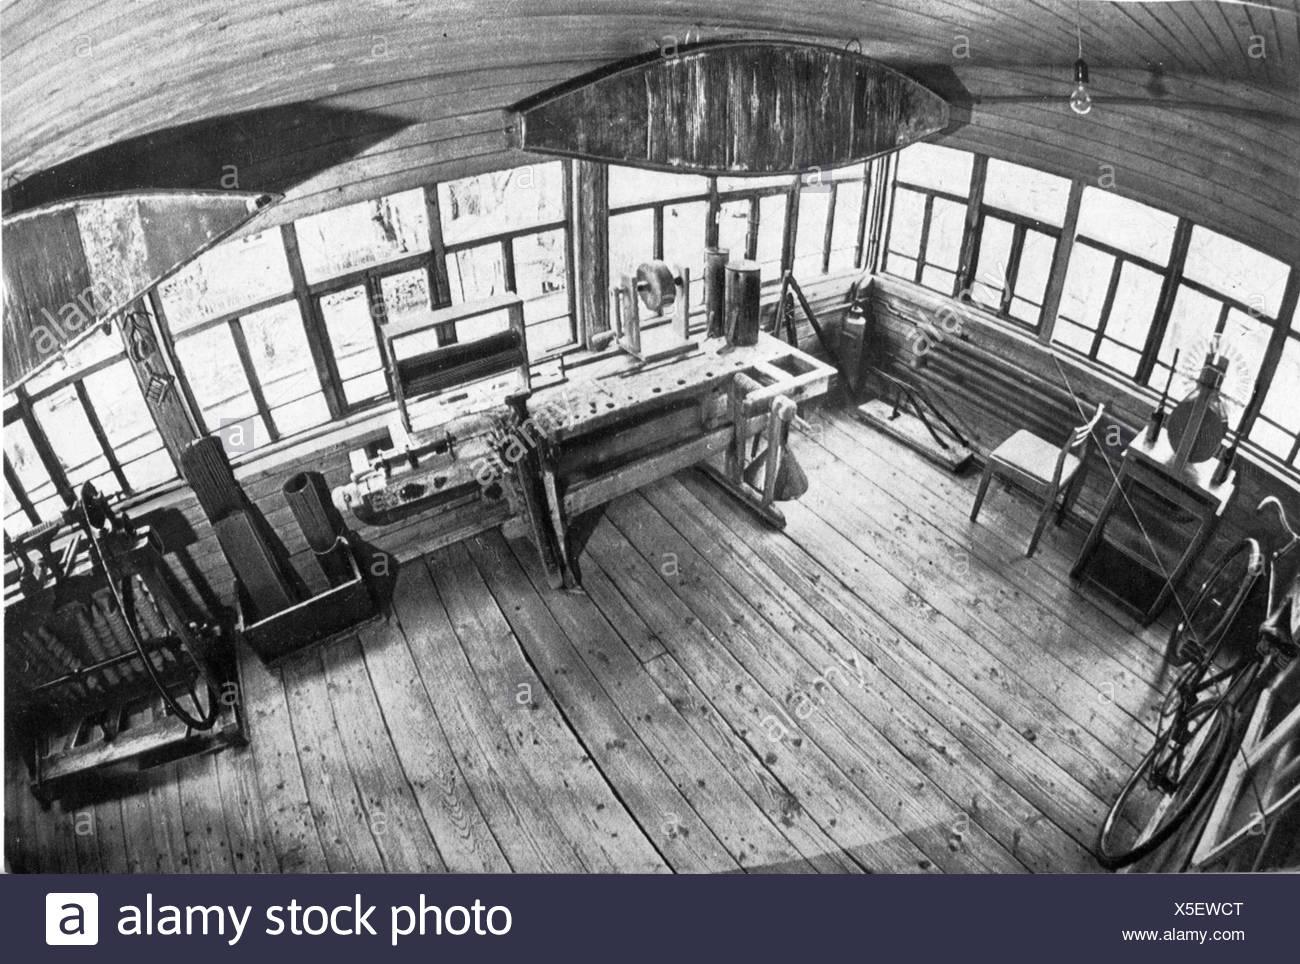 Tsiolkovskii, Konstantin Eduardovich, 17.9.1857 - 19.9.1935, russischer Physiker, Mathematikhistoriker, seine Werkstatt, Stockfoto